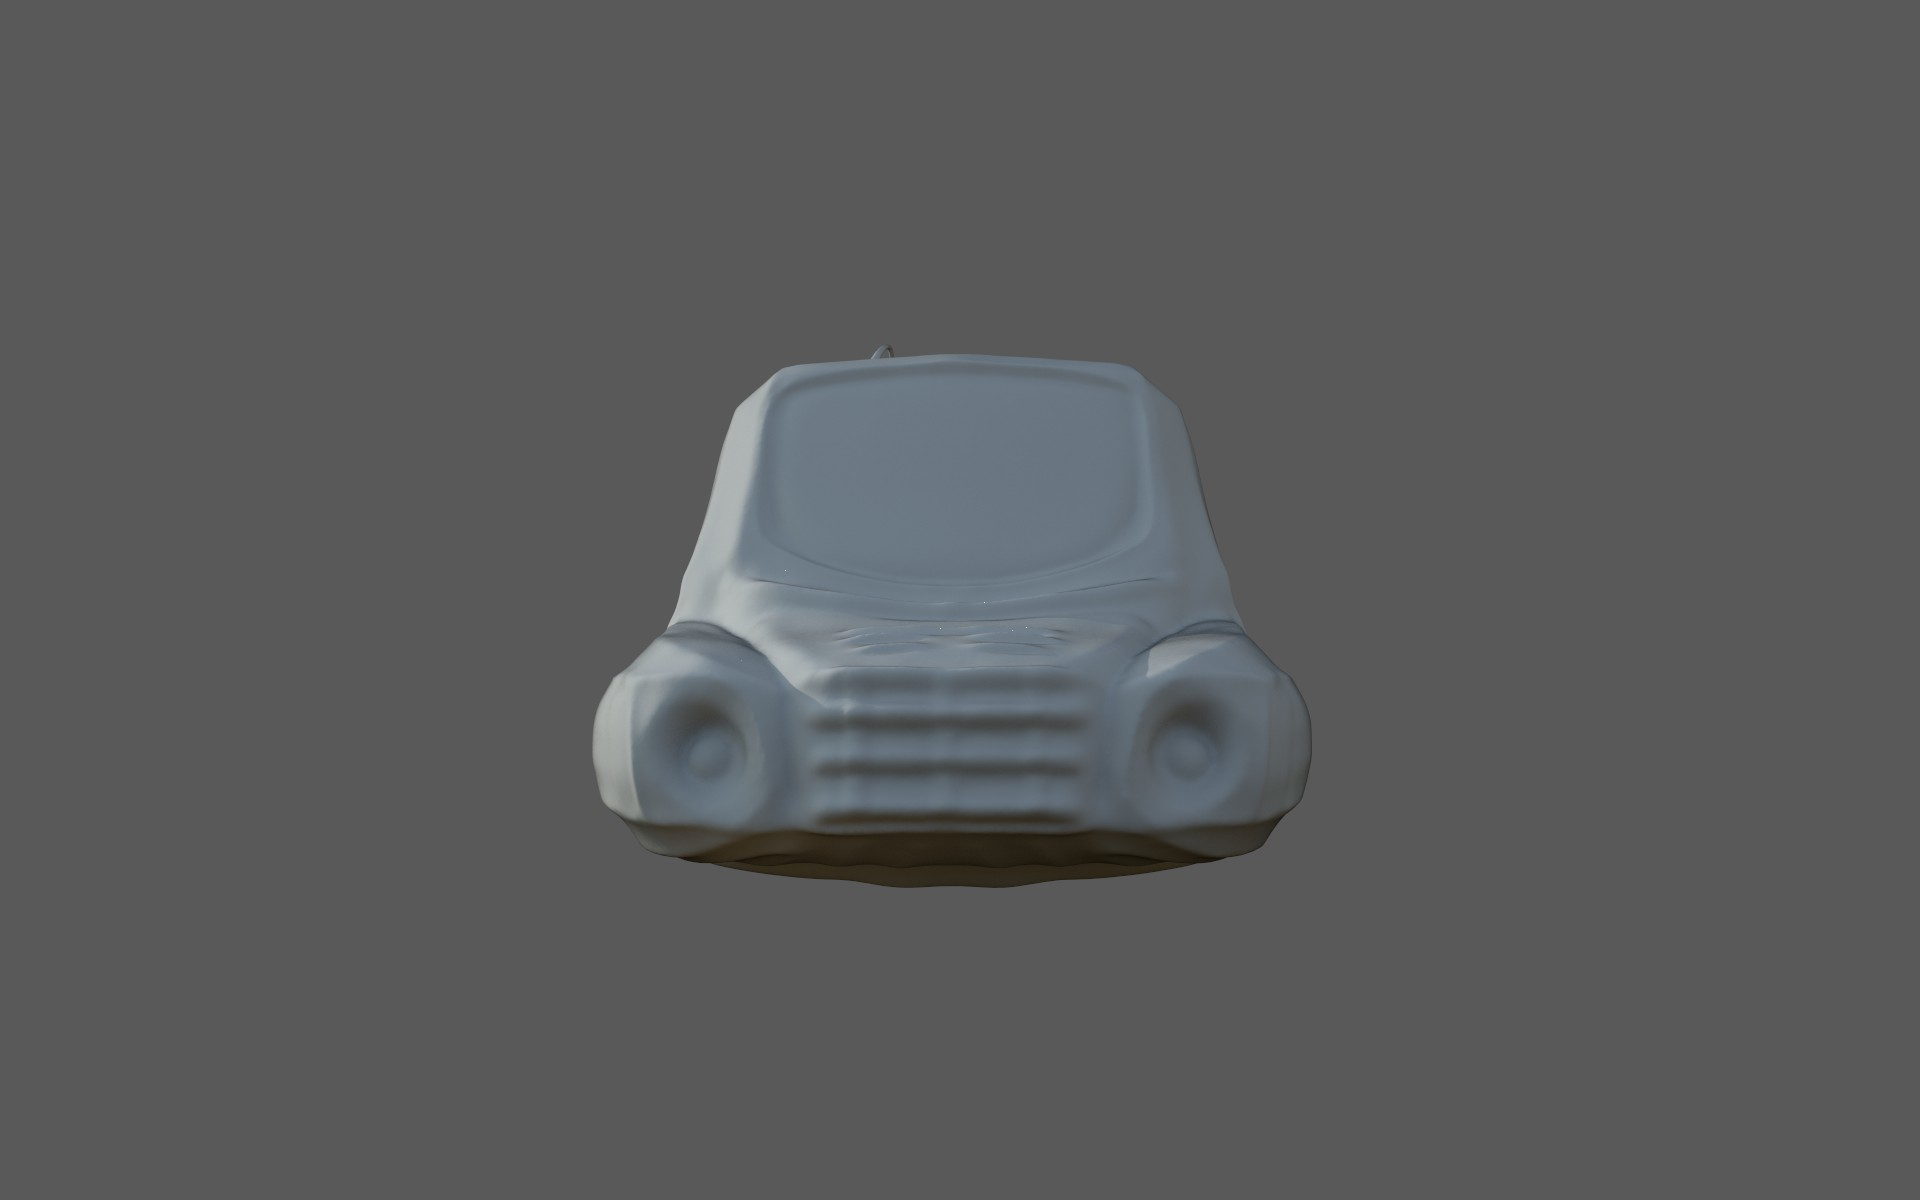 Matej chalachan car2